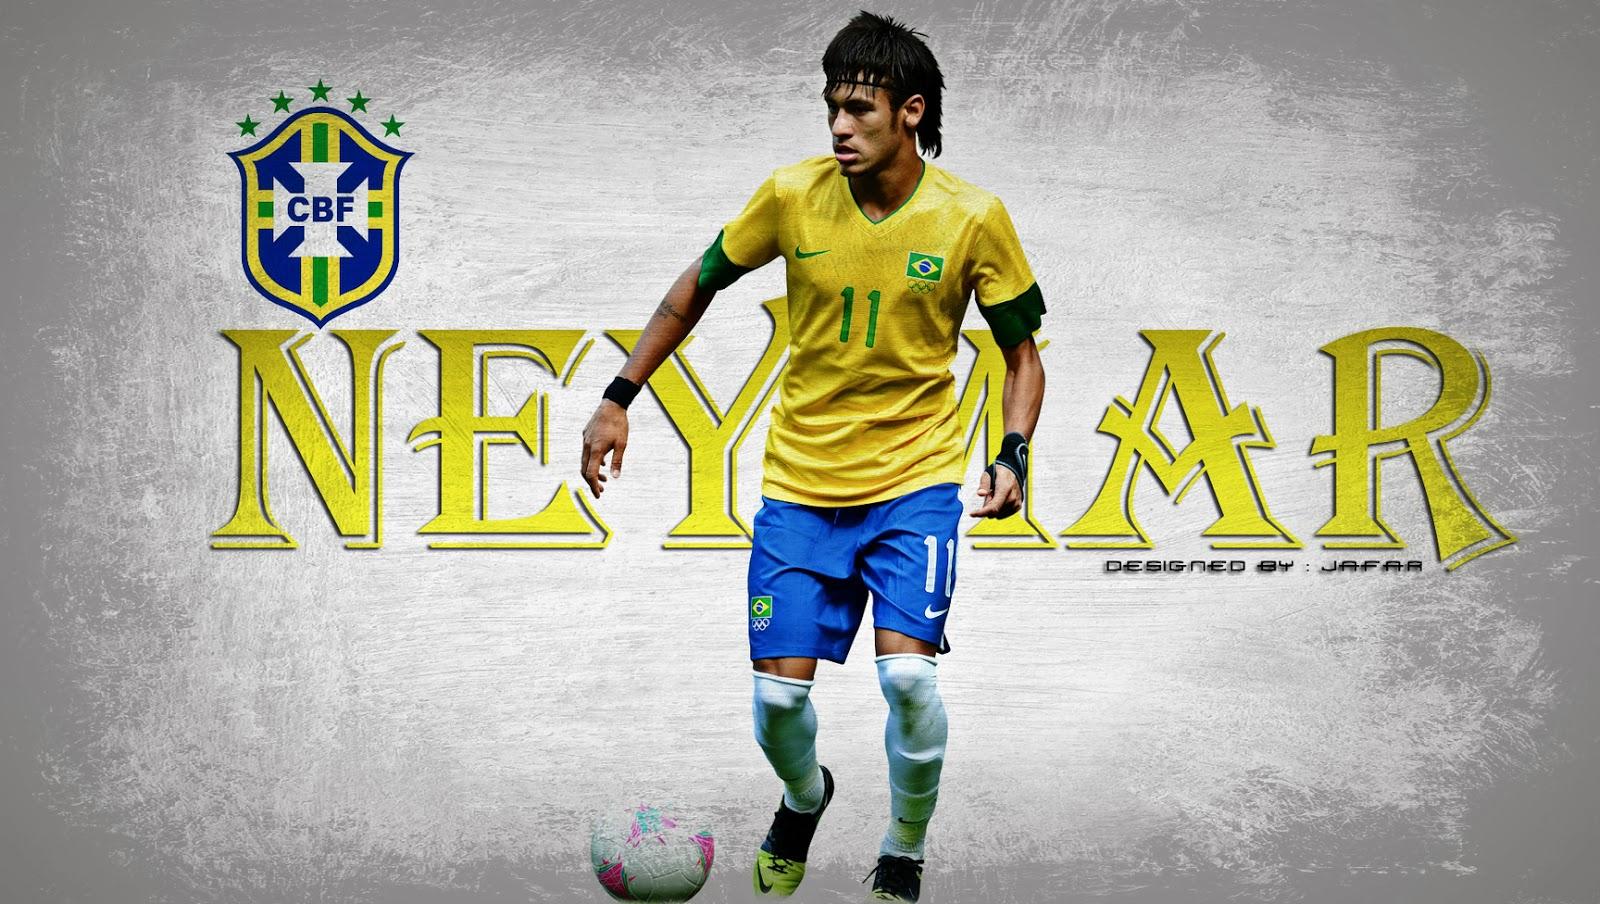 Football Neymar HD Wallpapers 1600x904